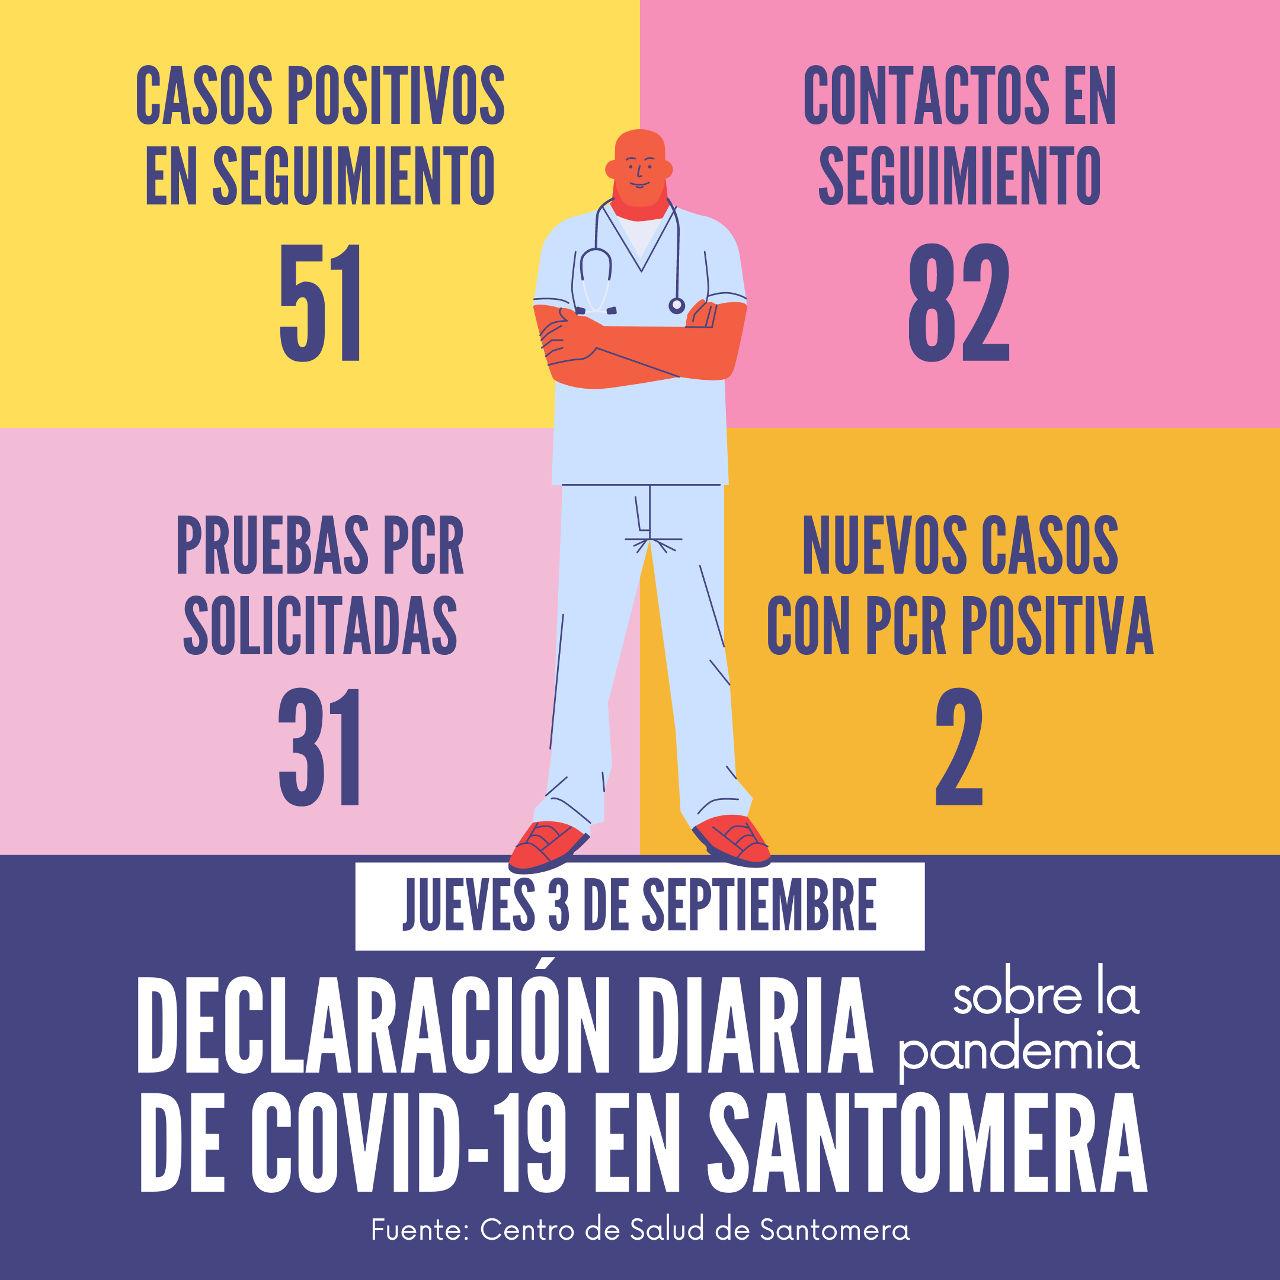 20200903_Datos COVID-19 Santomera